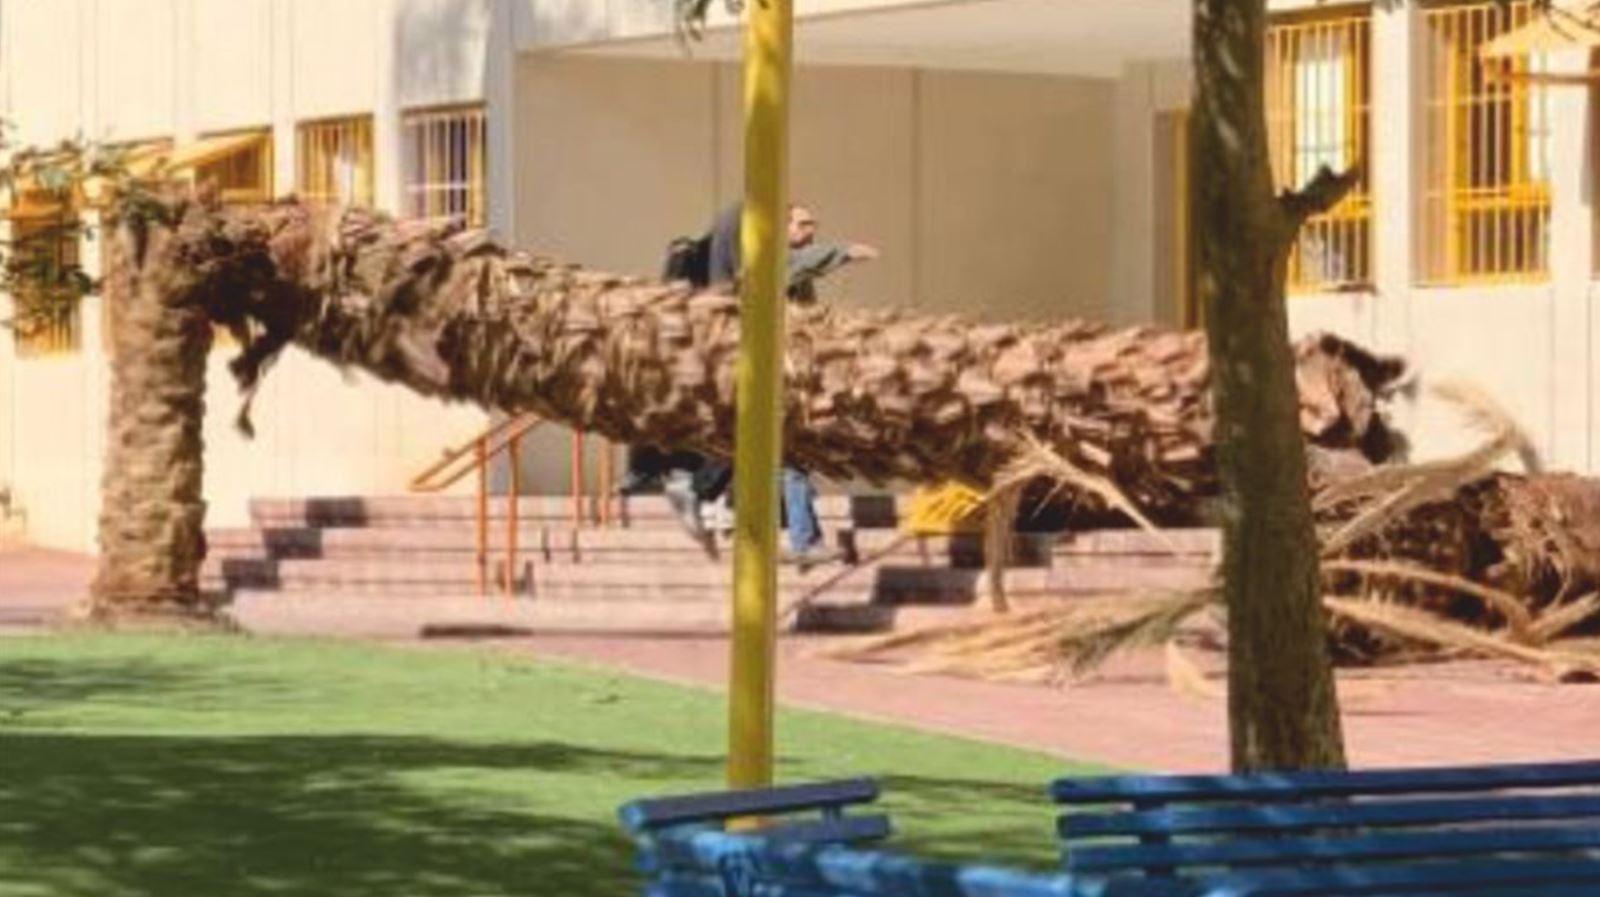 עץ דקל קרס בחצר בית הספר בגין - בנס נמנע אסון